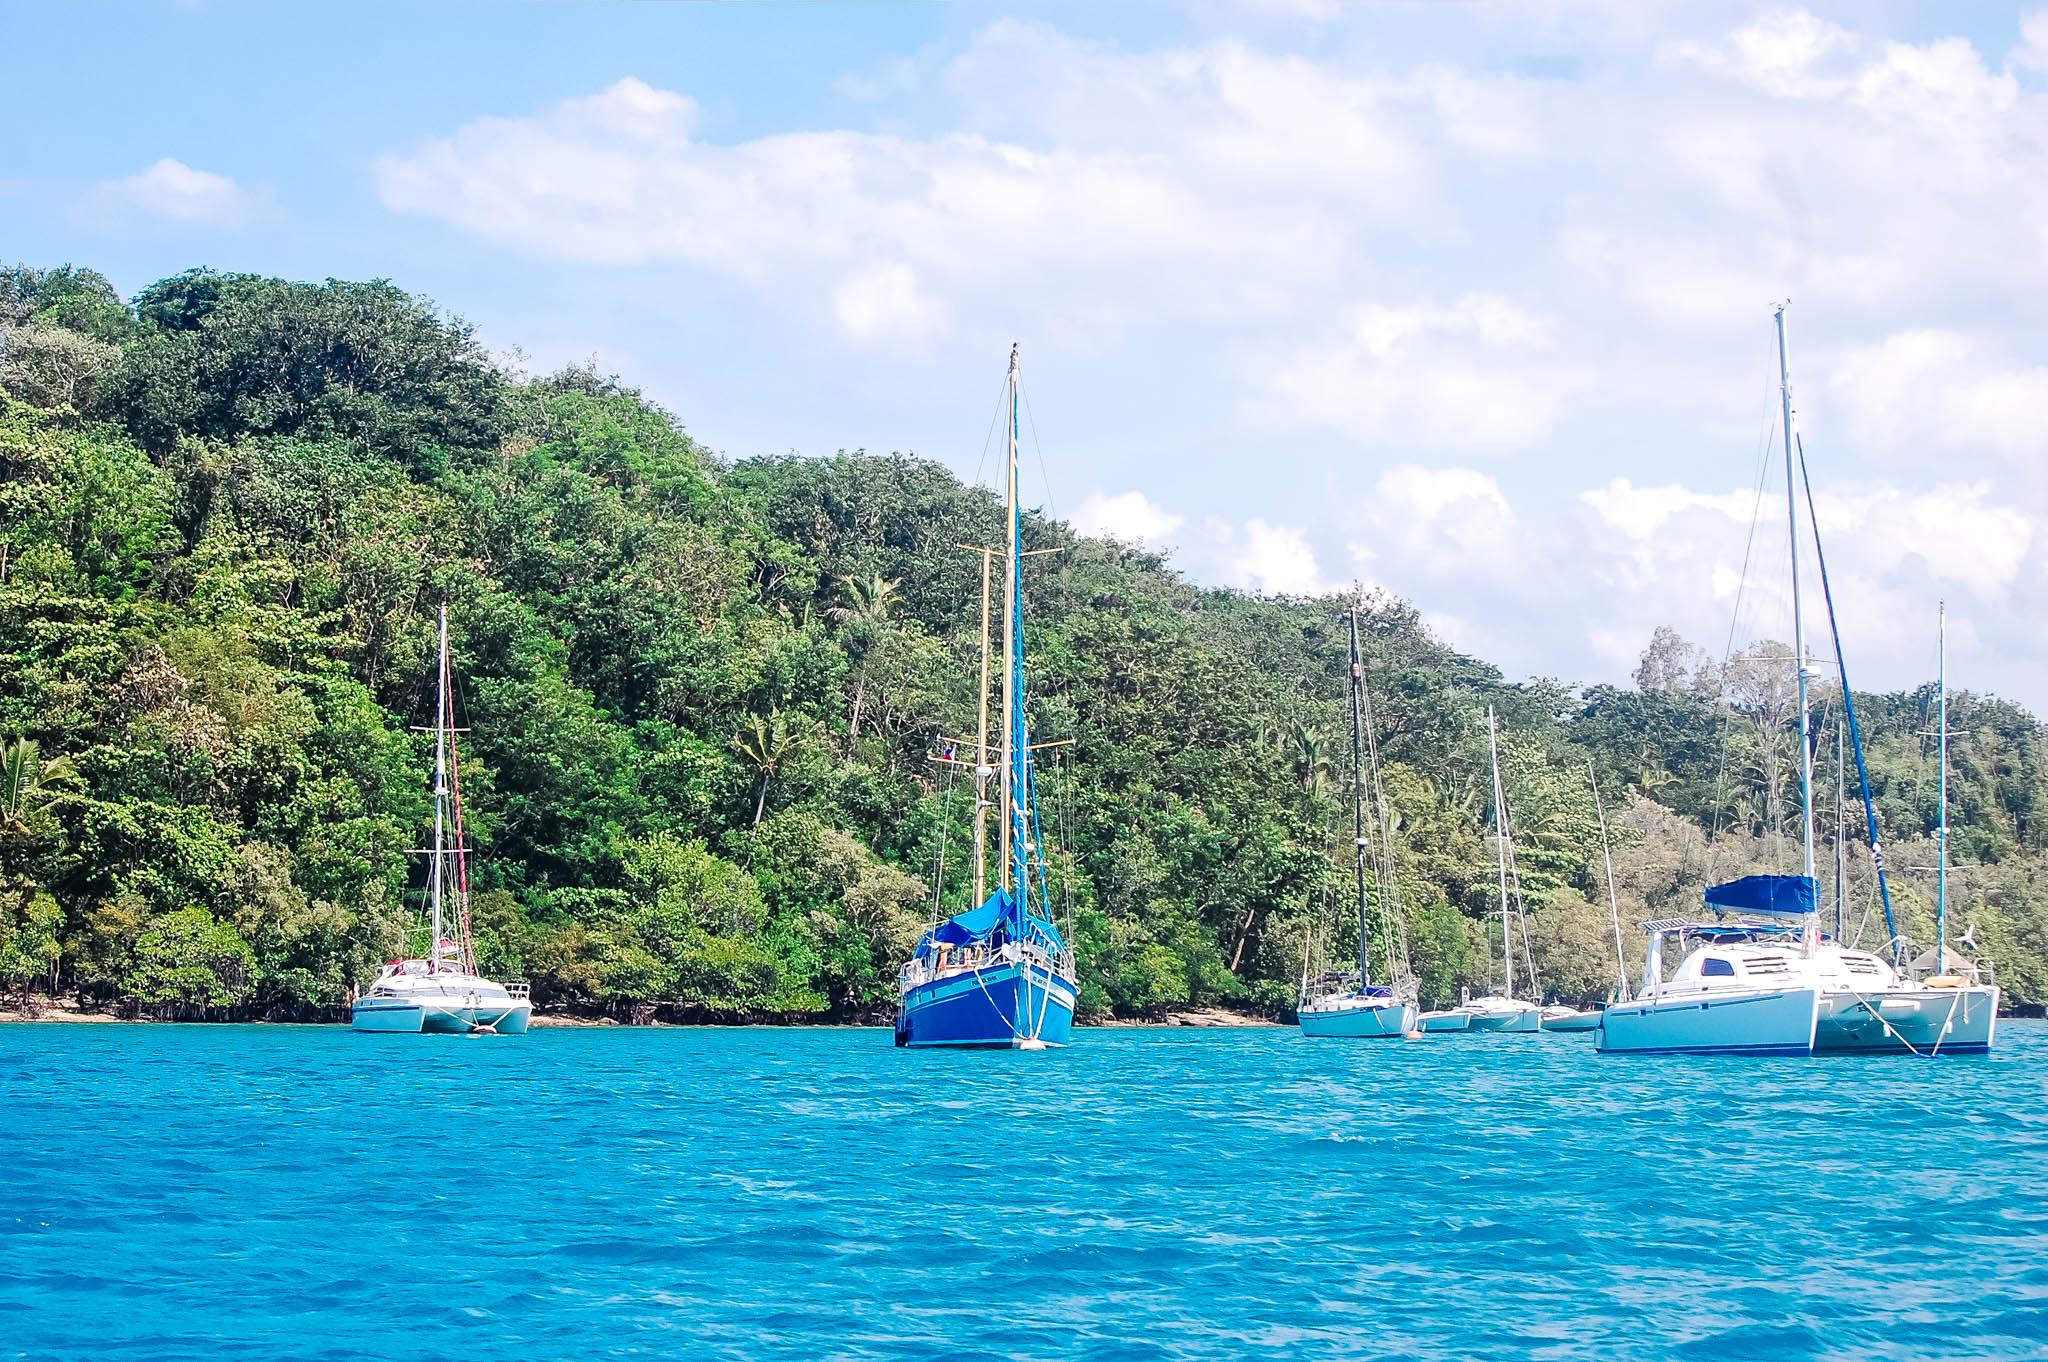 puerto galera 13 (1 of 1)